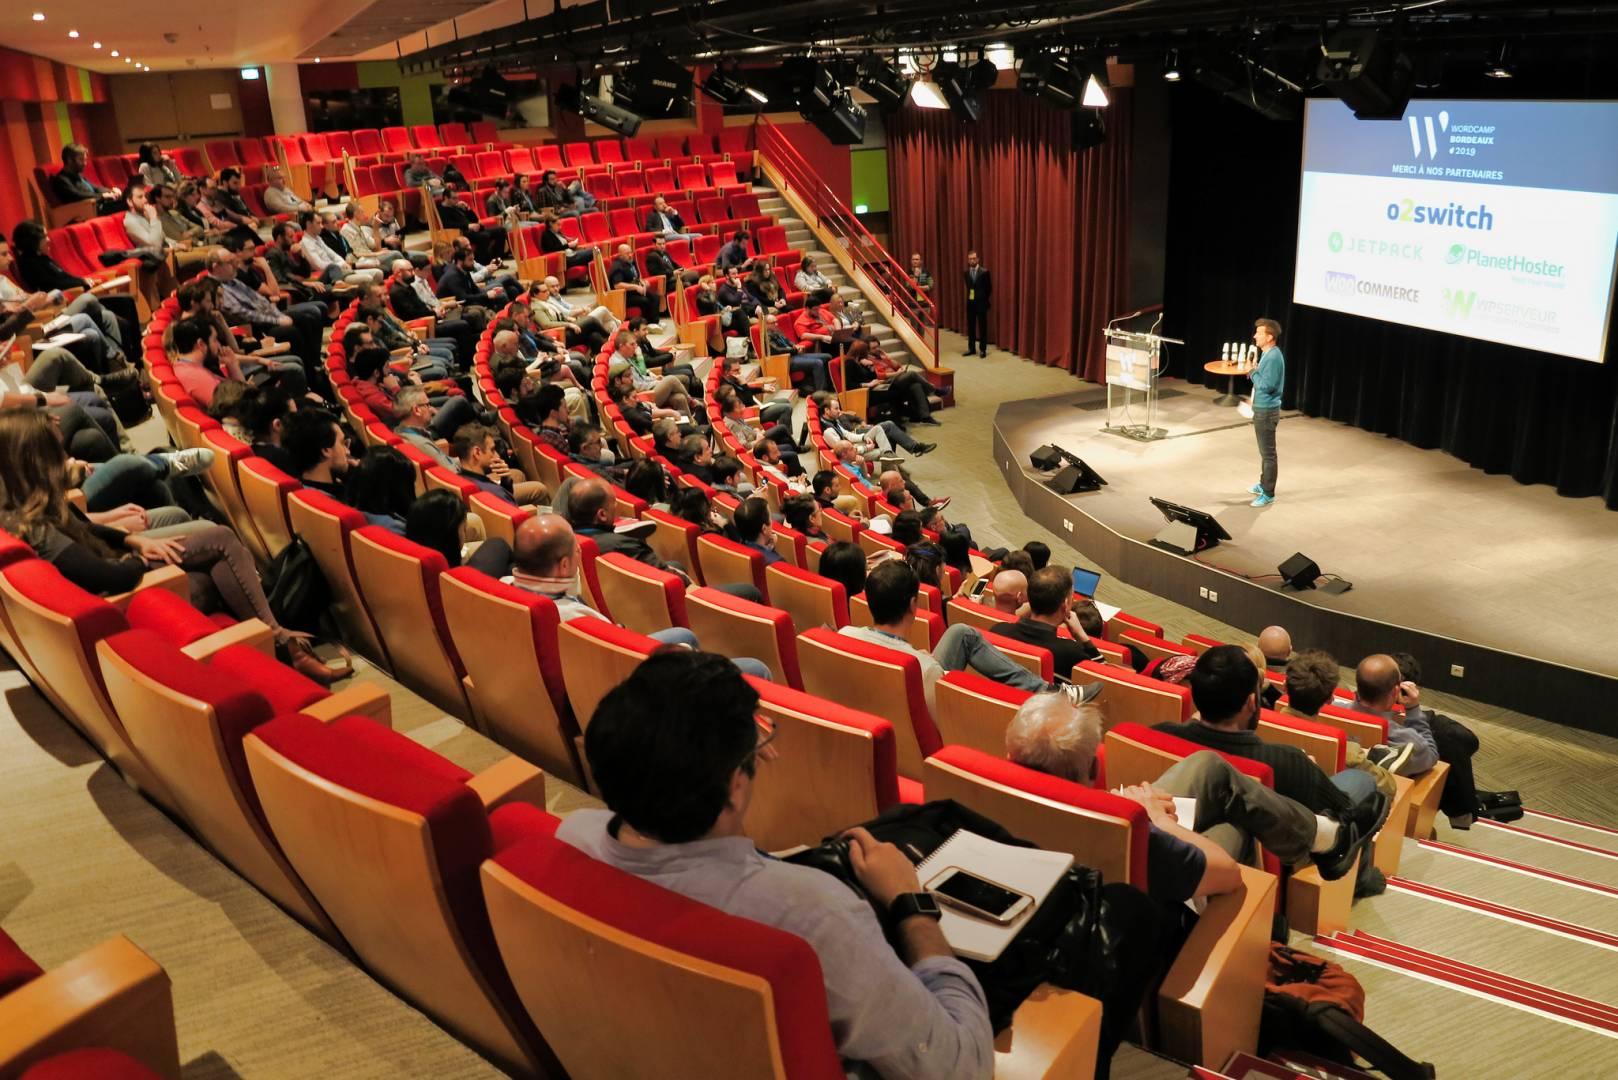 20190323 Wordcamp Bordeaux Salle FX